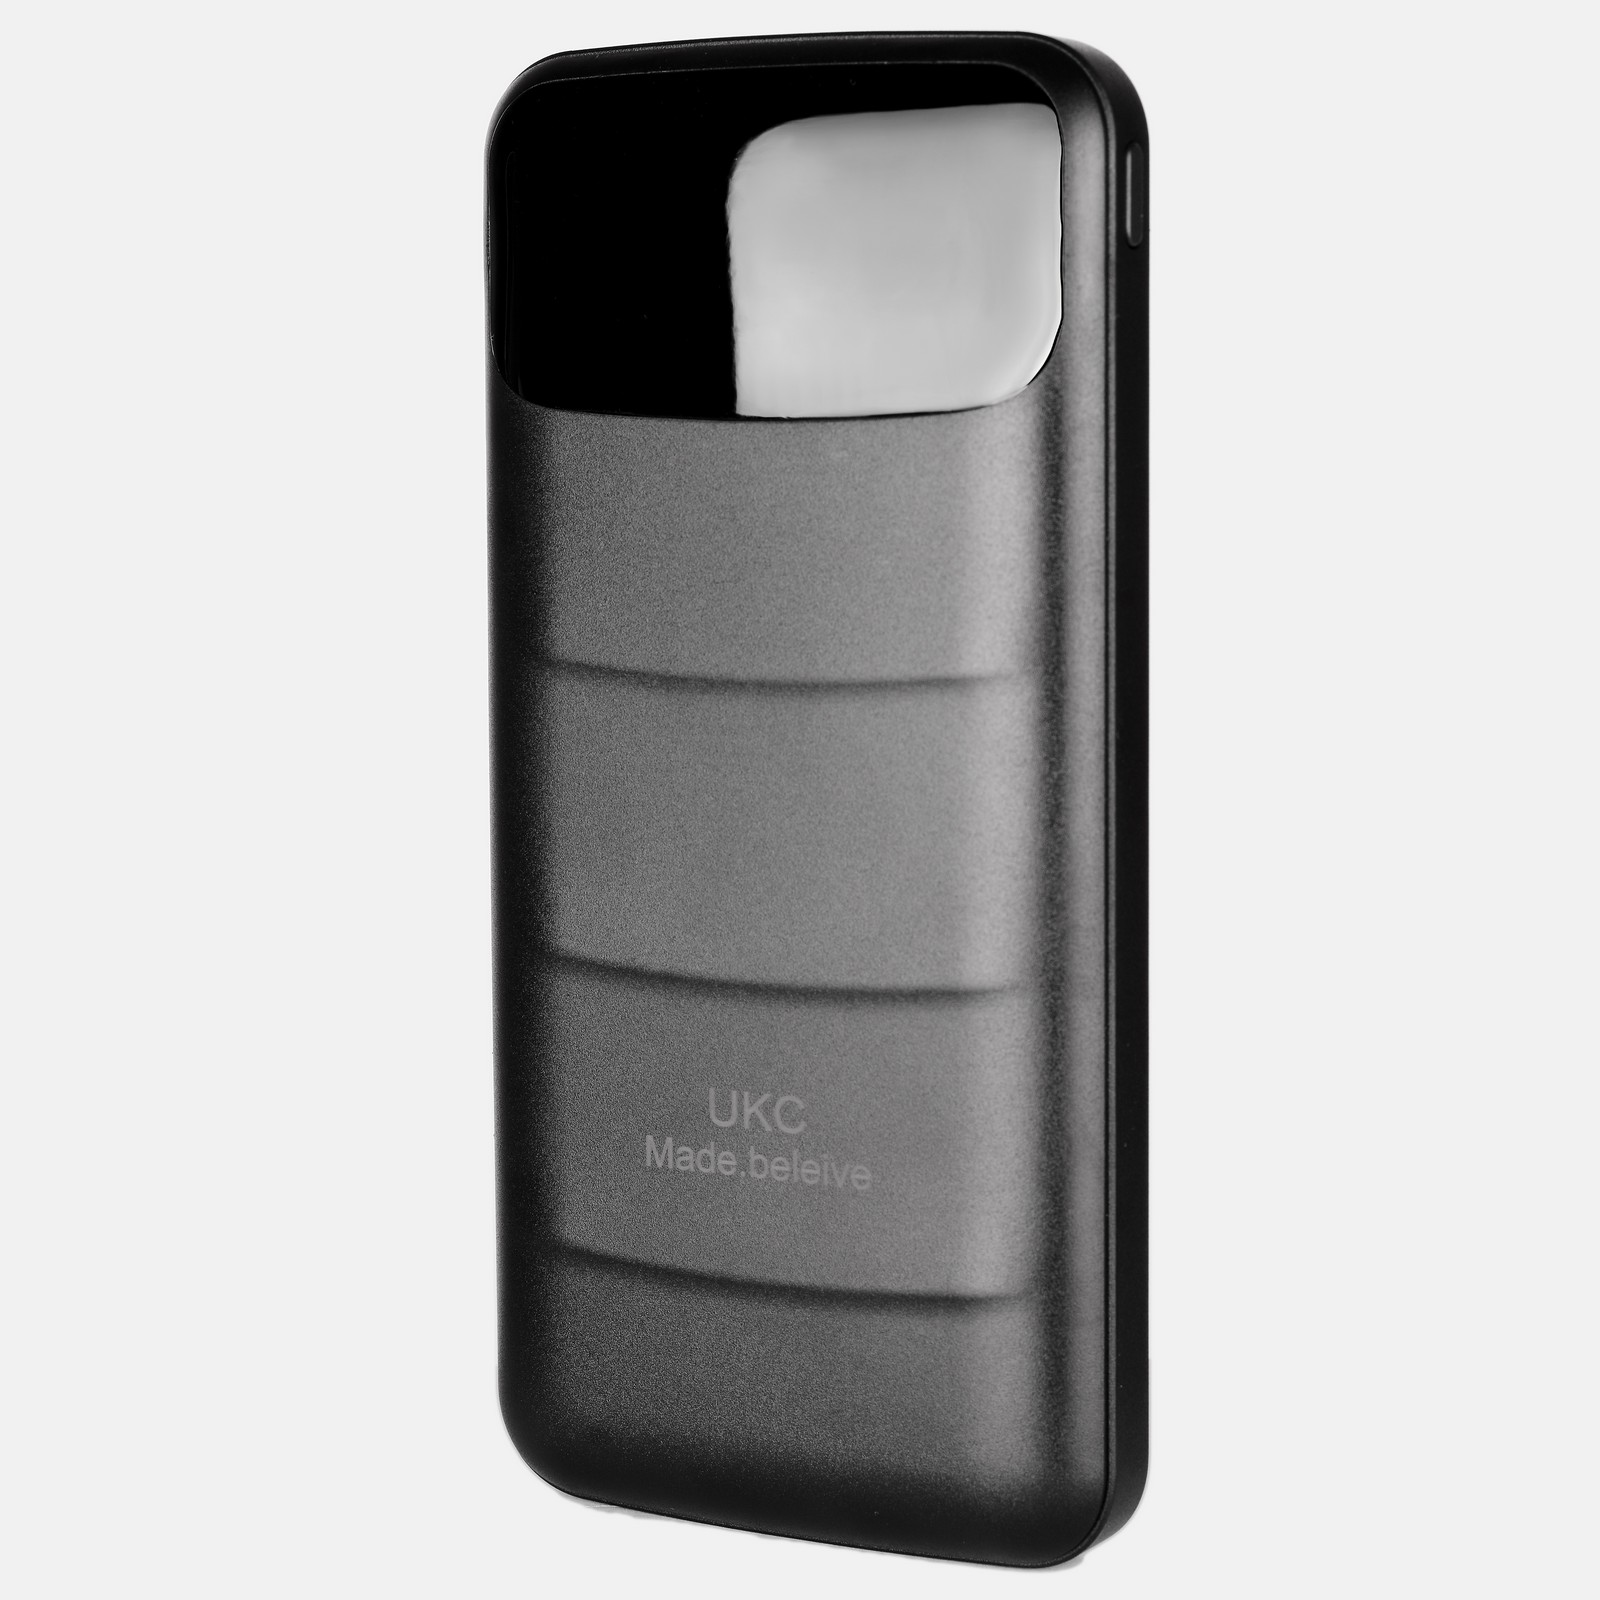 Внешний аккумулятор UKC 80000 мАч Black